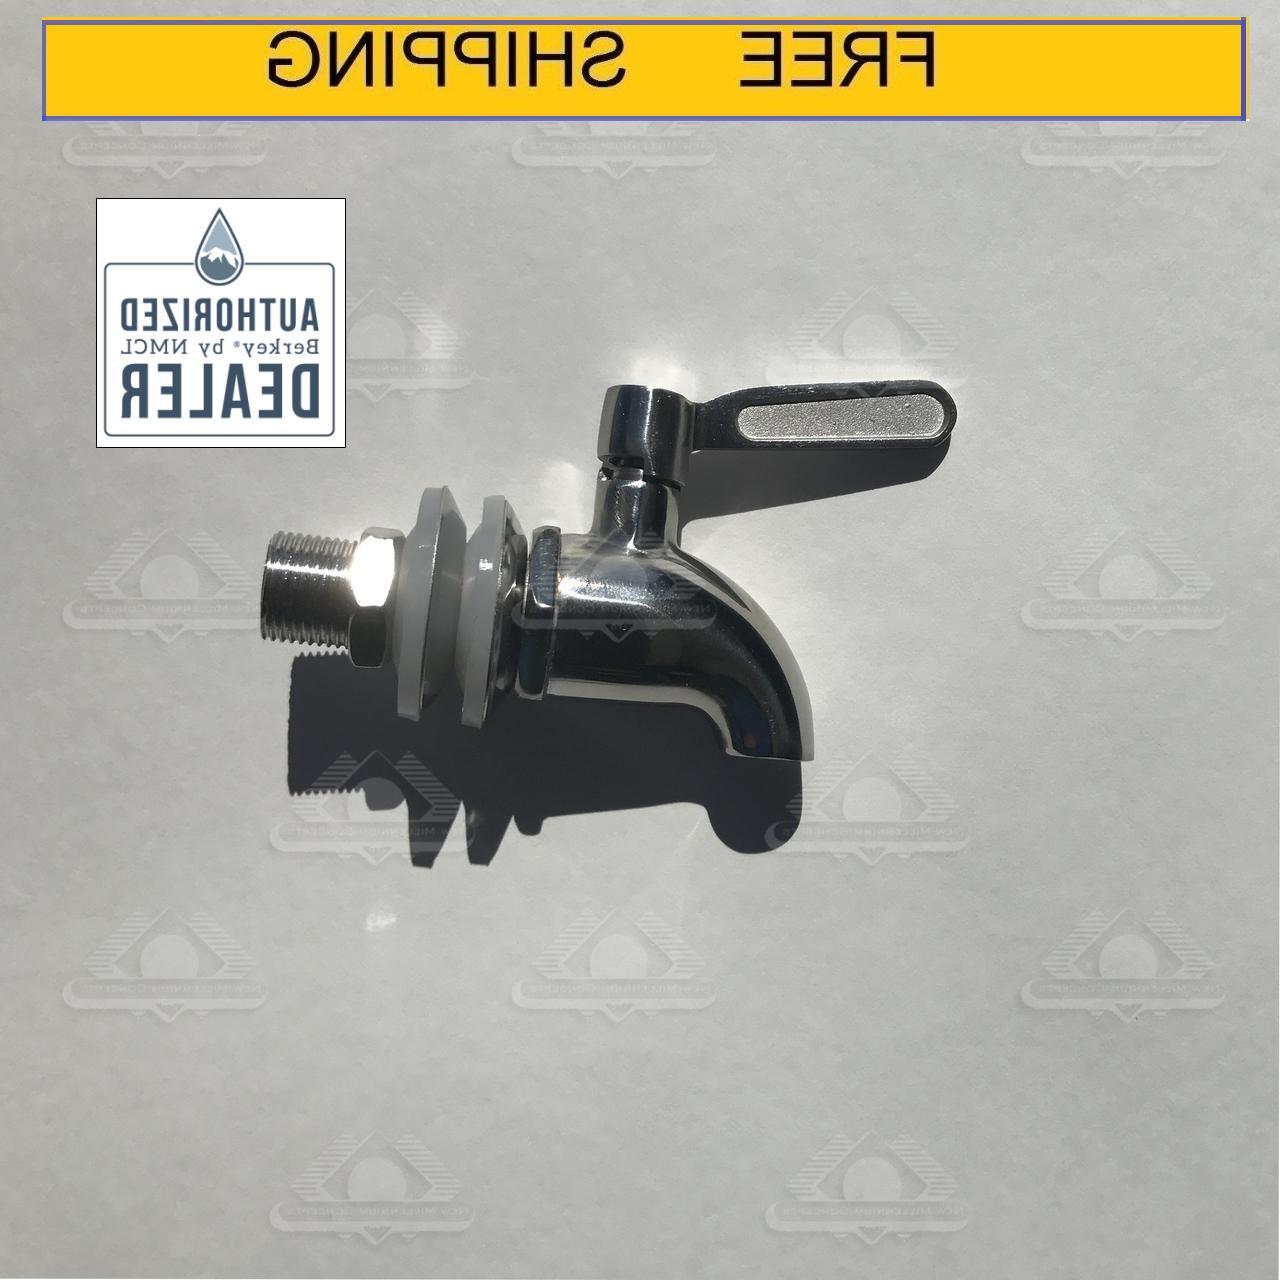 stainless steel spigot